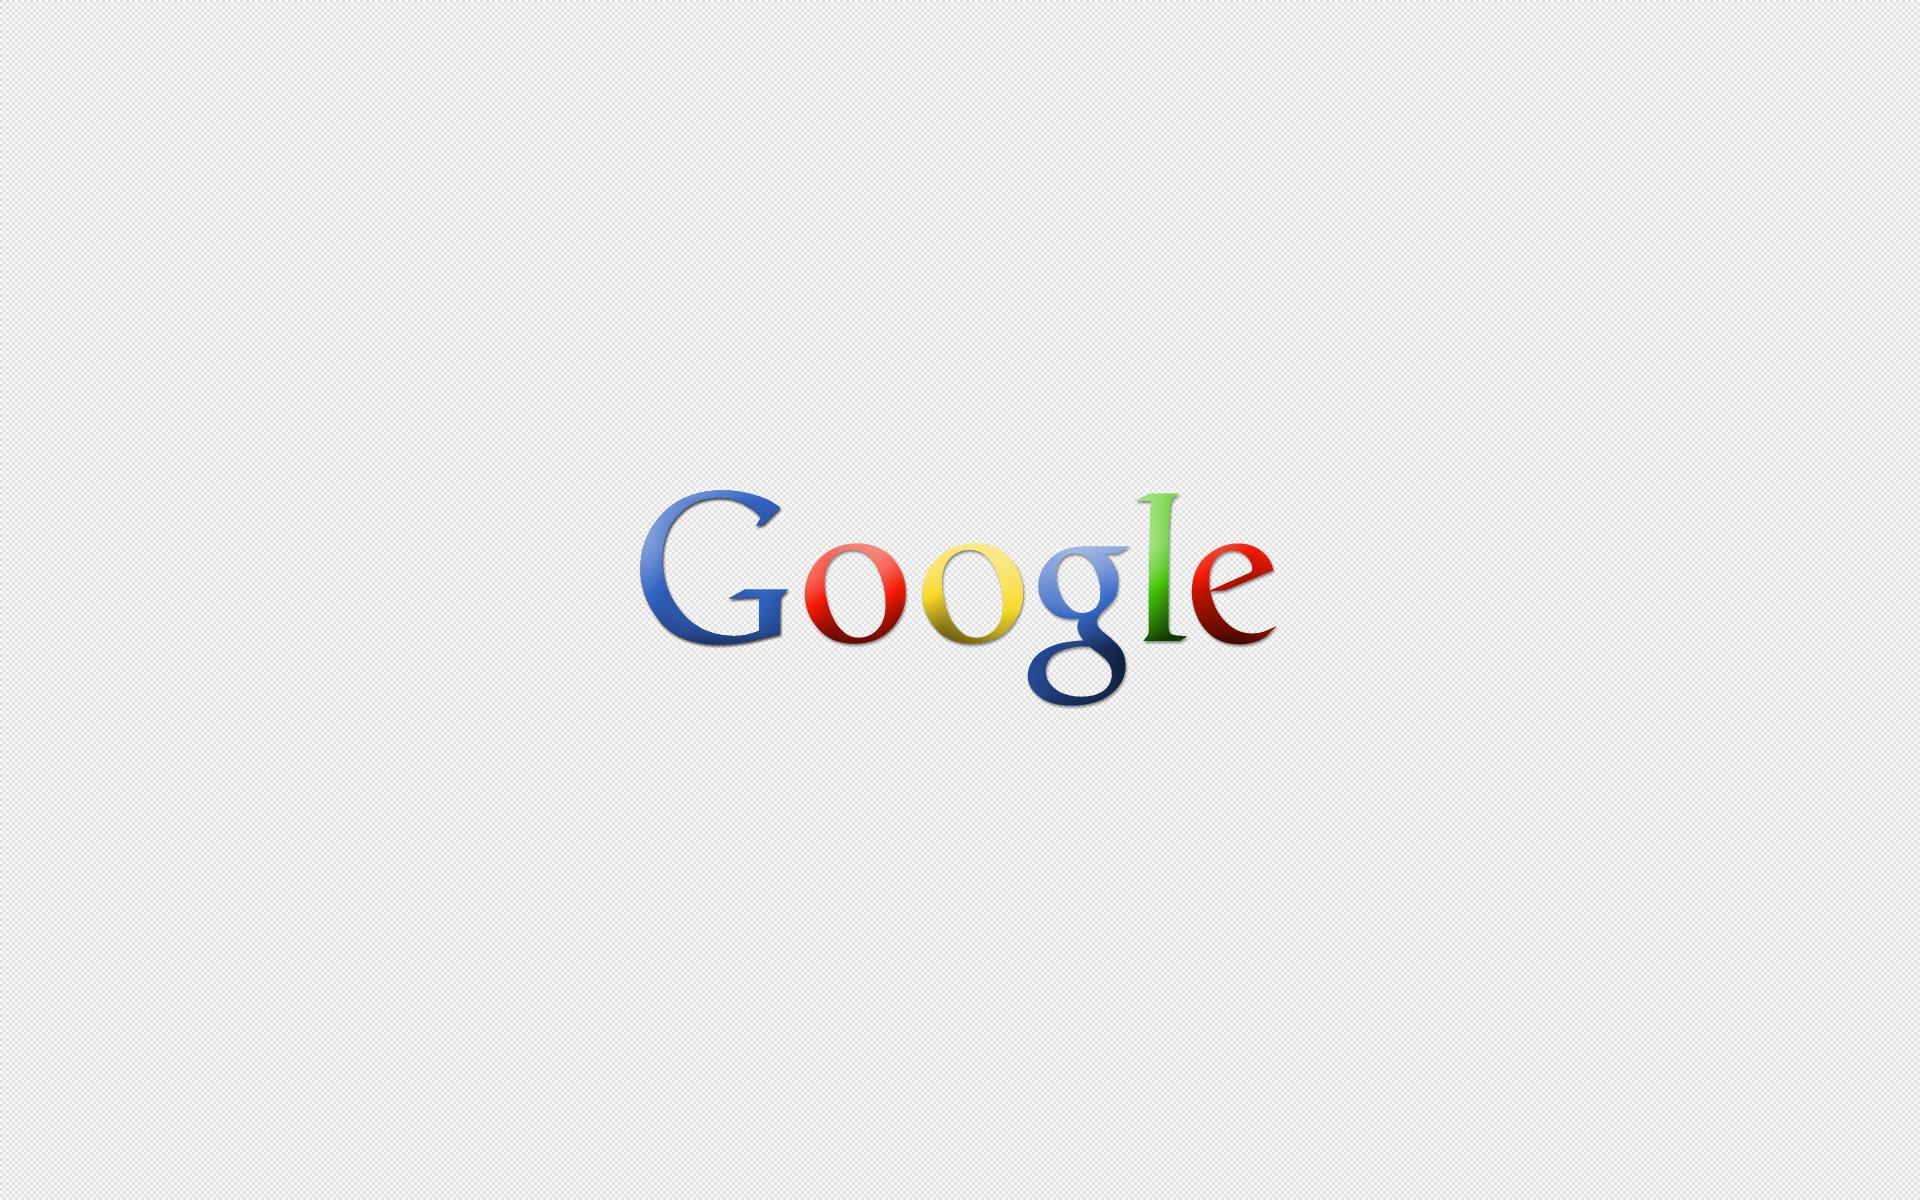 google desktop backgrounds free - wallpaper cave